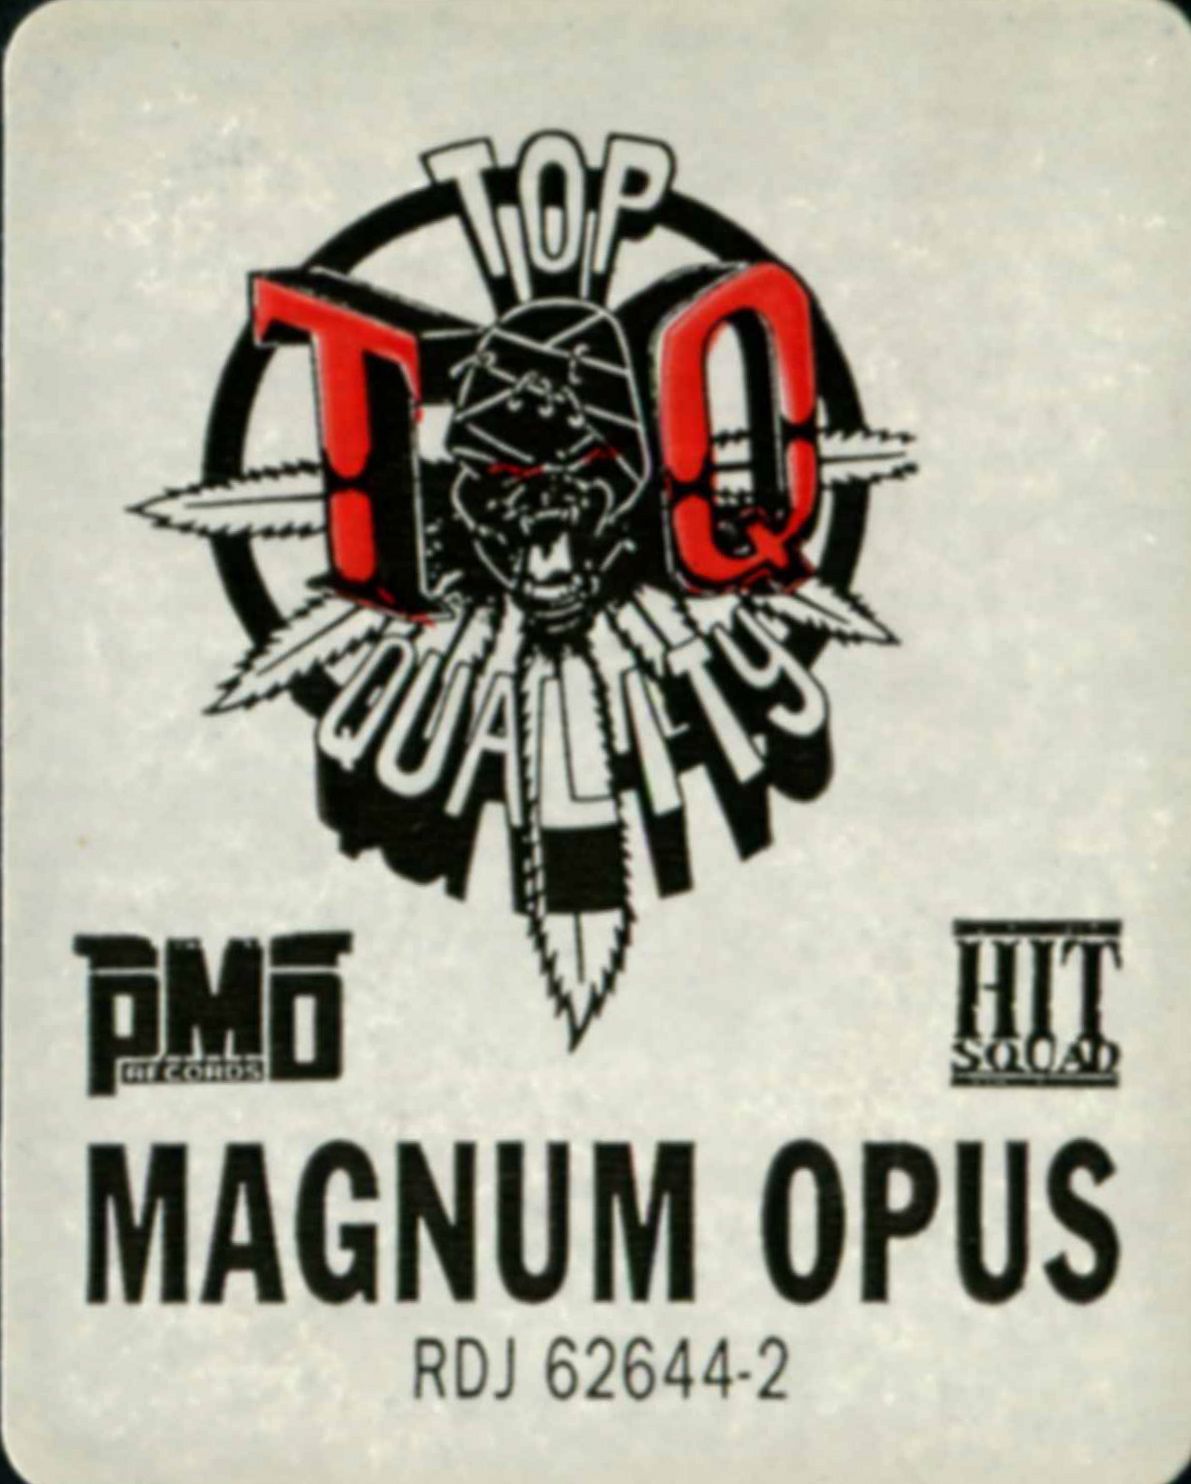 http://3.bp.blogspot.com/-kI8_EPDMb70/T5CorX13QuI/AAAAAAAADx8/BH2HmxeCozw/s1600/Top+Quality+Magnum+Opus+(Instrumental)+FRONT.jpg